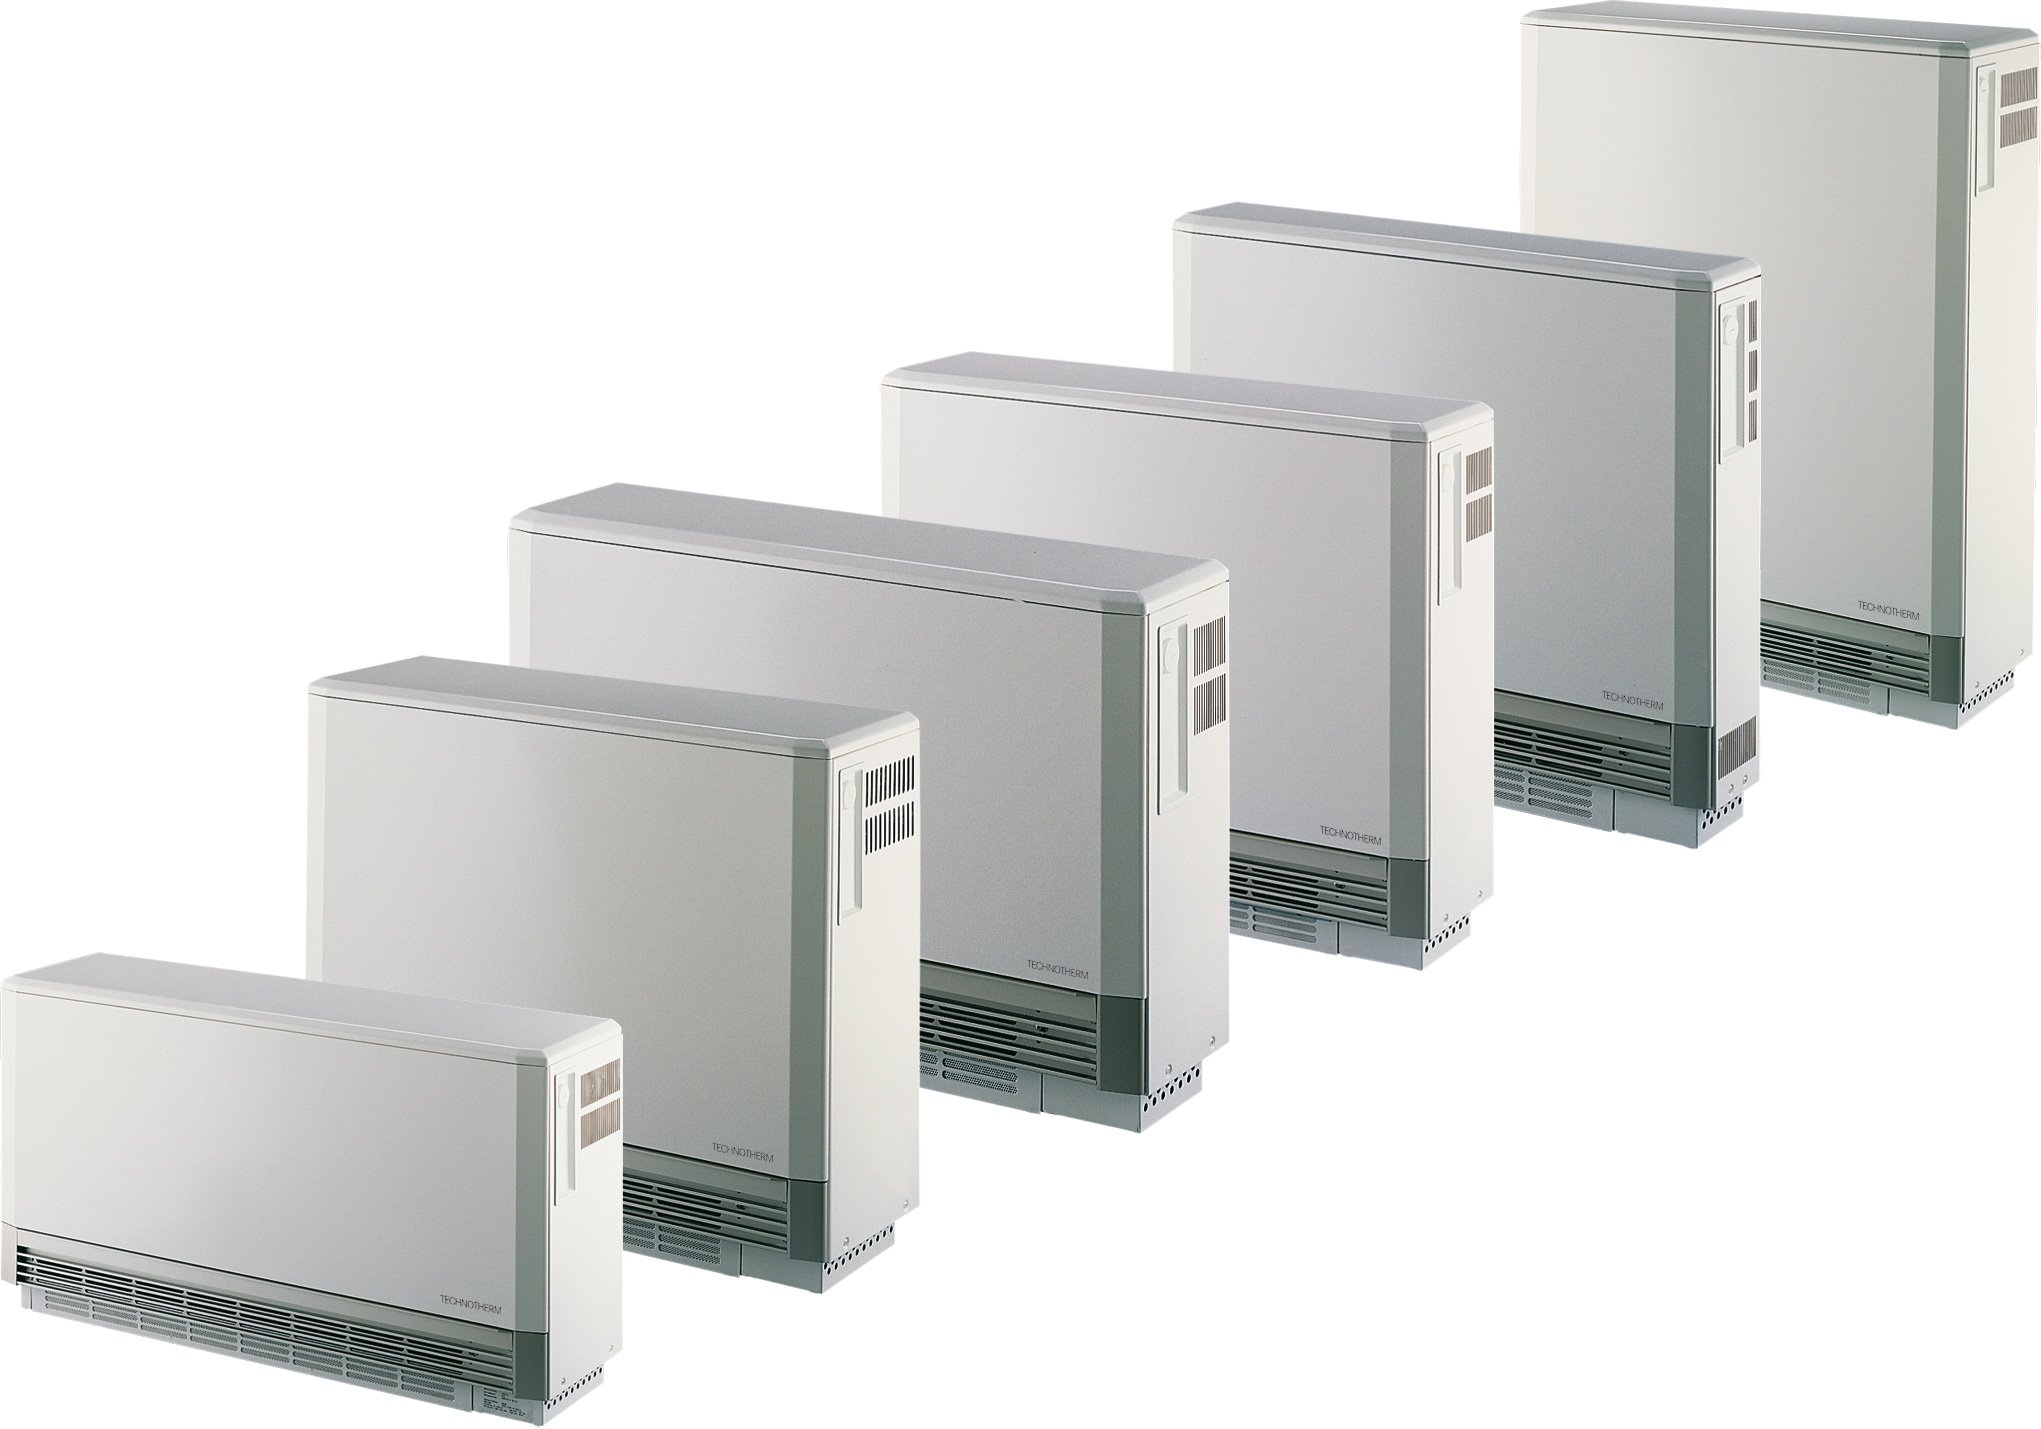 Elektroheizung Speicherheizung